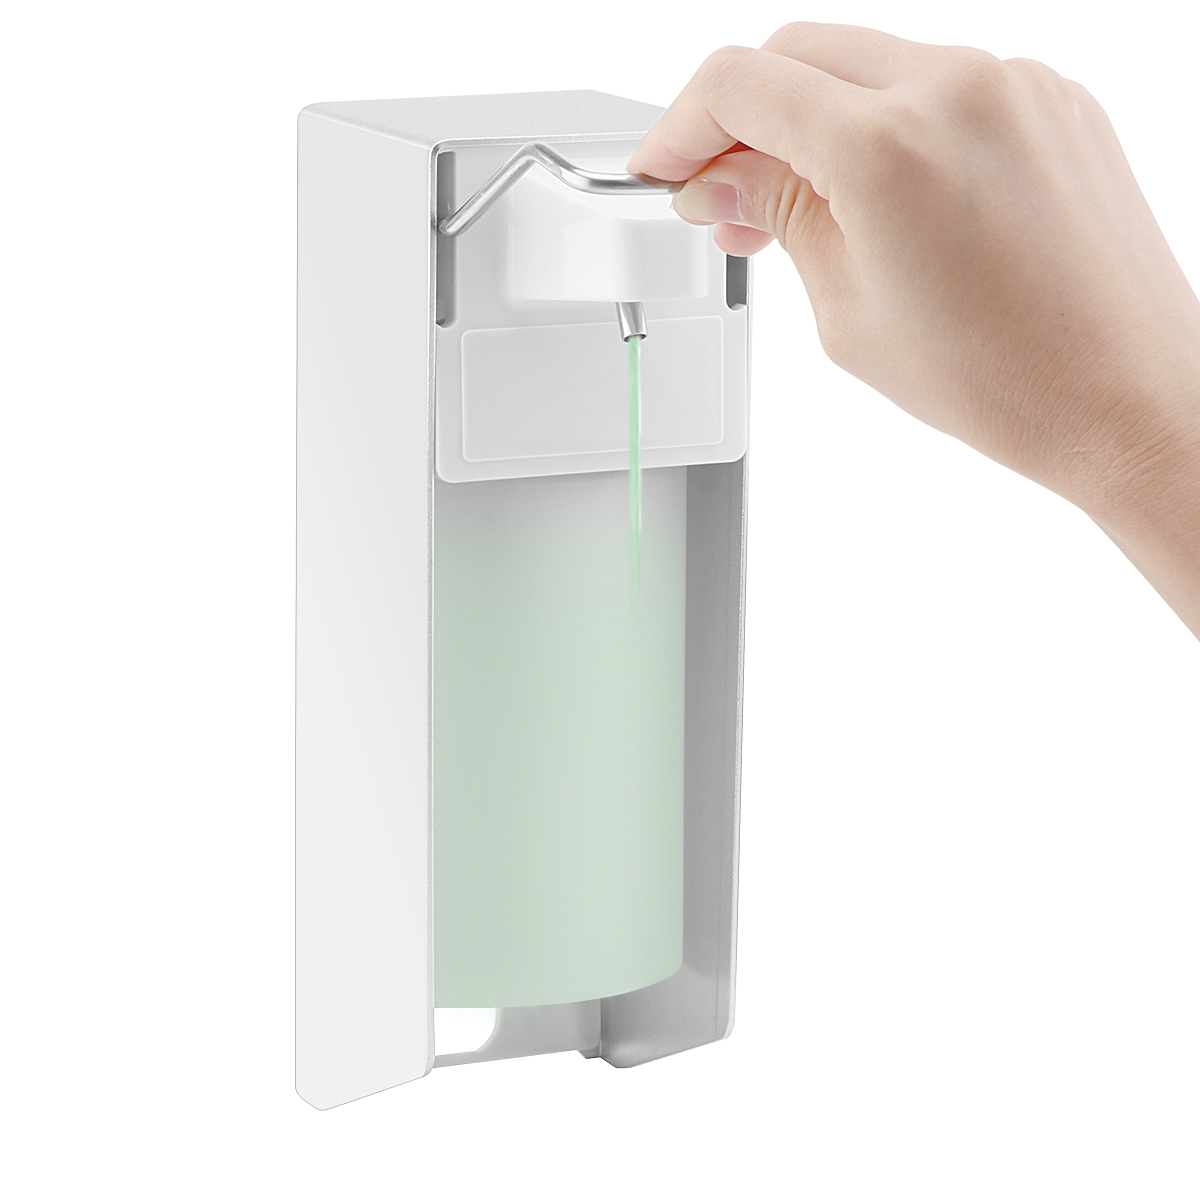 Wall Mount Liquid Soap Dispenser Pump Hospital Elbow Press Hand Sanitizer Soap Dispenser Bottle For Kitchen Wall-Mount Liquid Soap Dispenser Pump Hospital Elbow Press Hand Sanitizer Soap Dispenser Bottle For Kitchen Hotel Bathroom